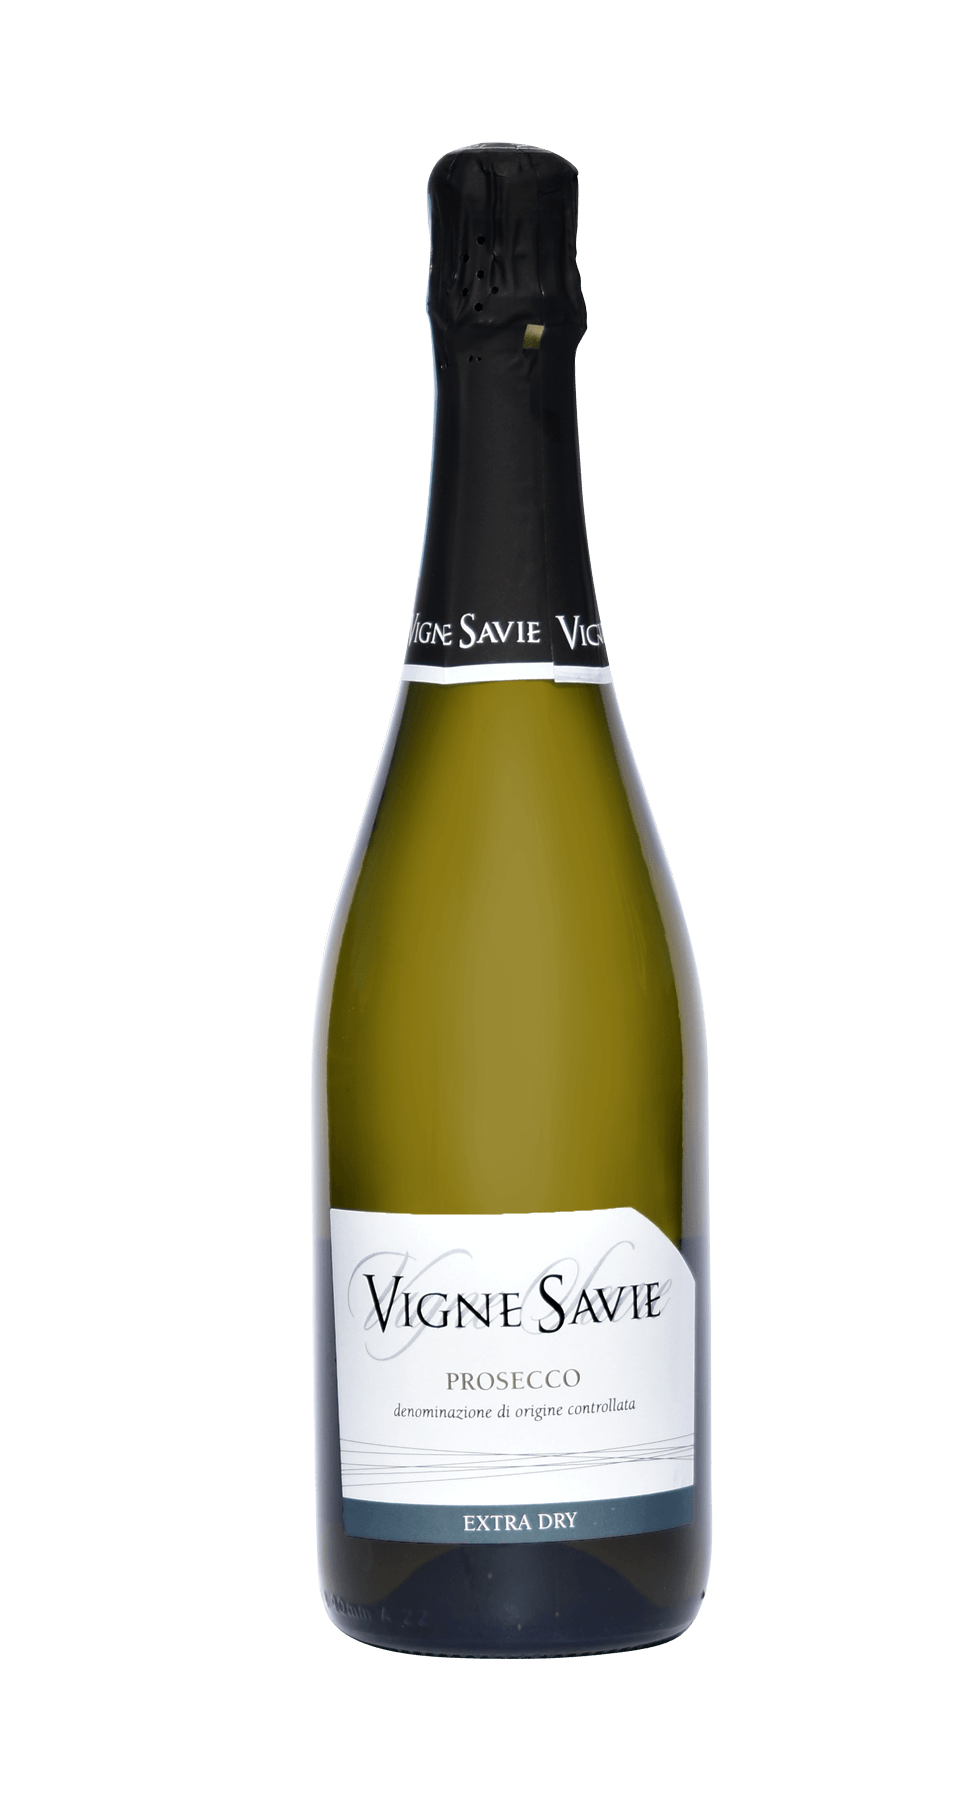 bottiglia vino prosecco extra dry vigne savie